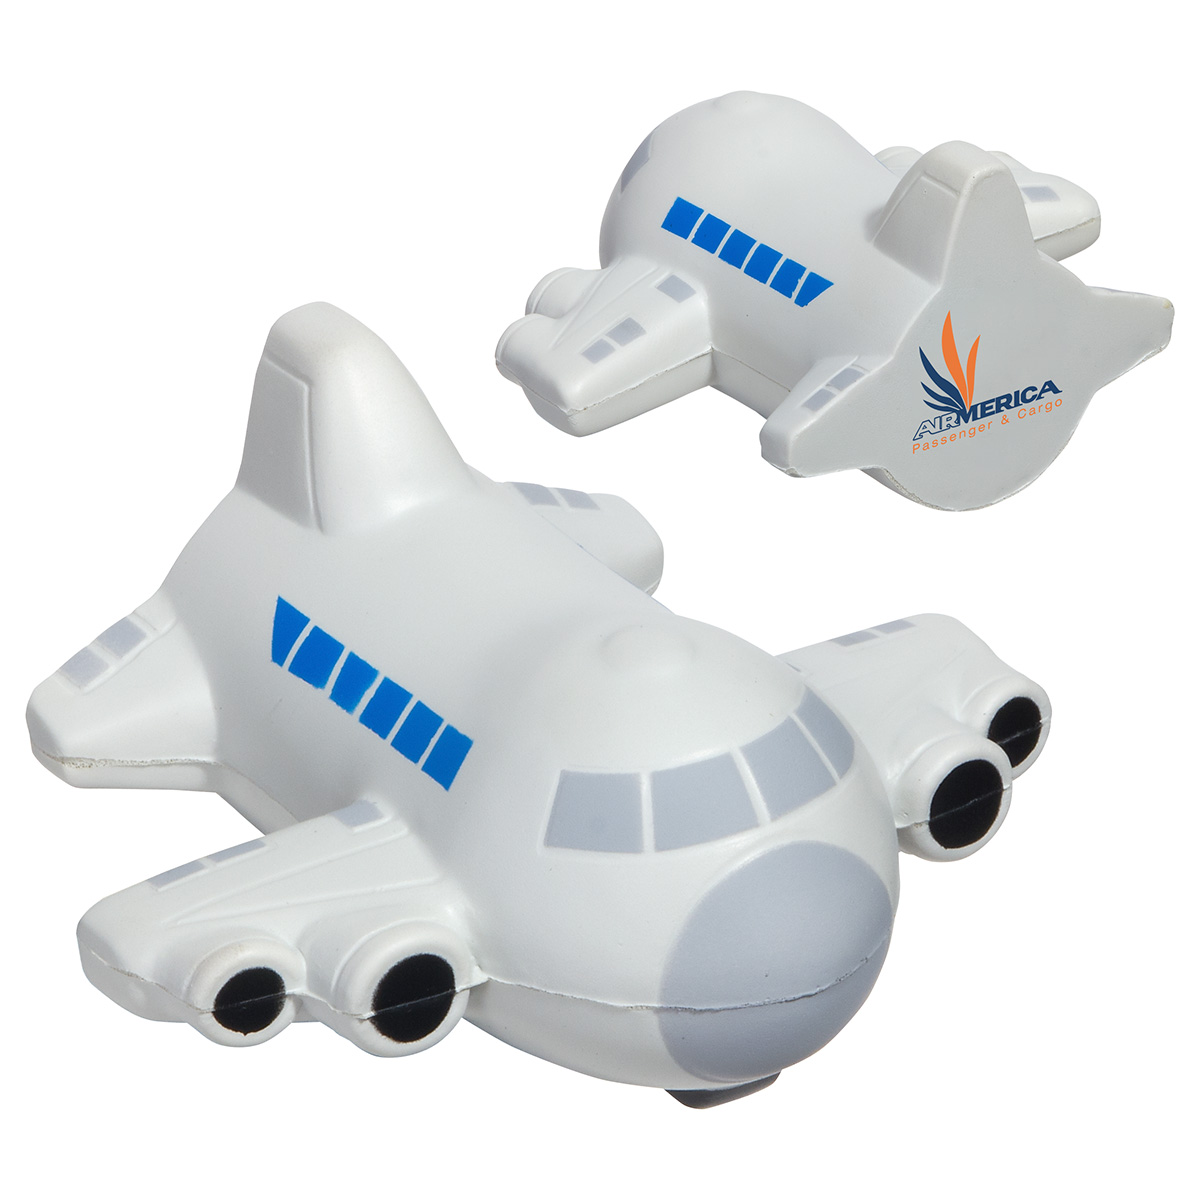 Small Airplane Stress Reliever, LAR-SA03, 1 Colour Imprint